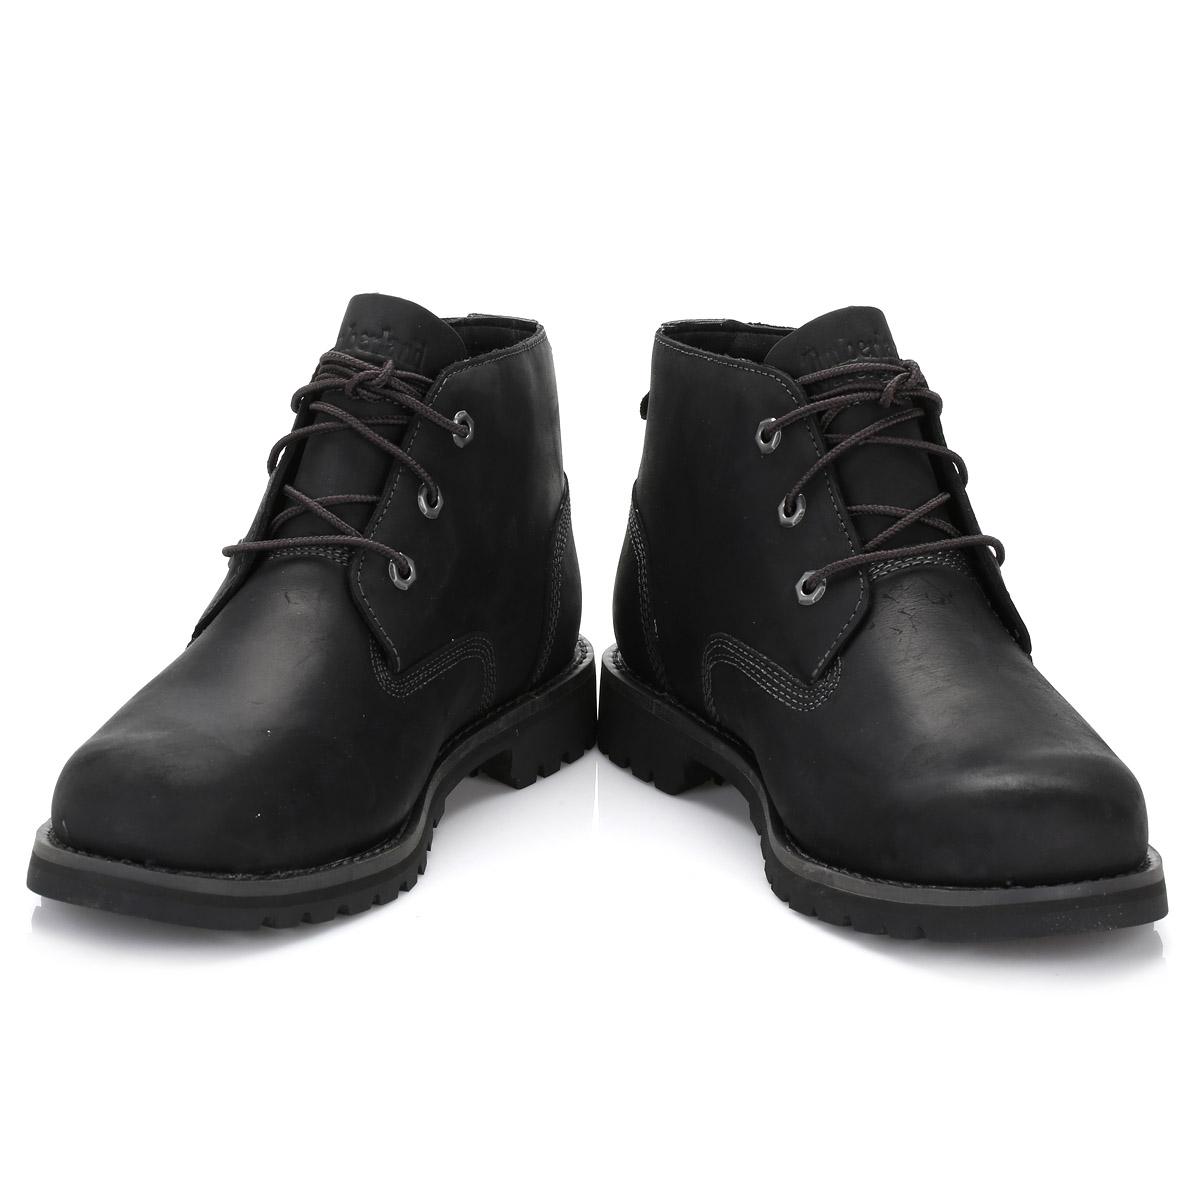 timberland mens chukka boots black leather larchmont